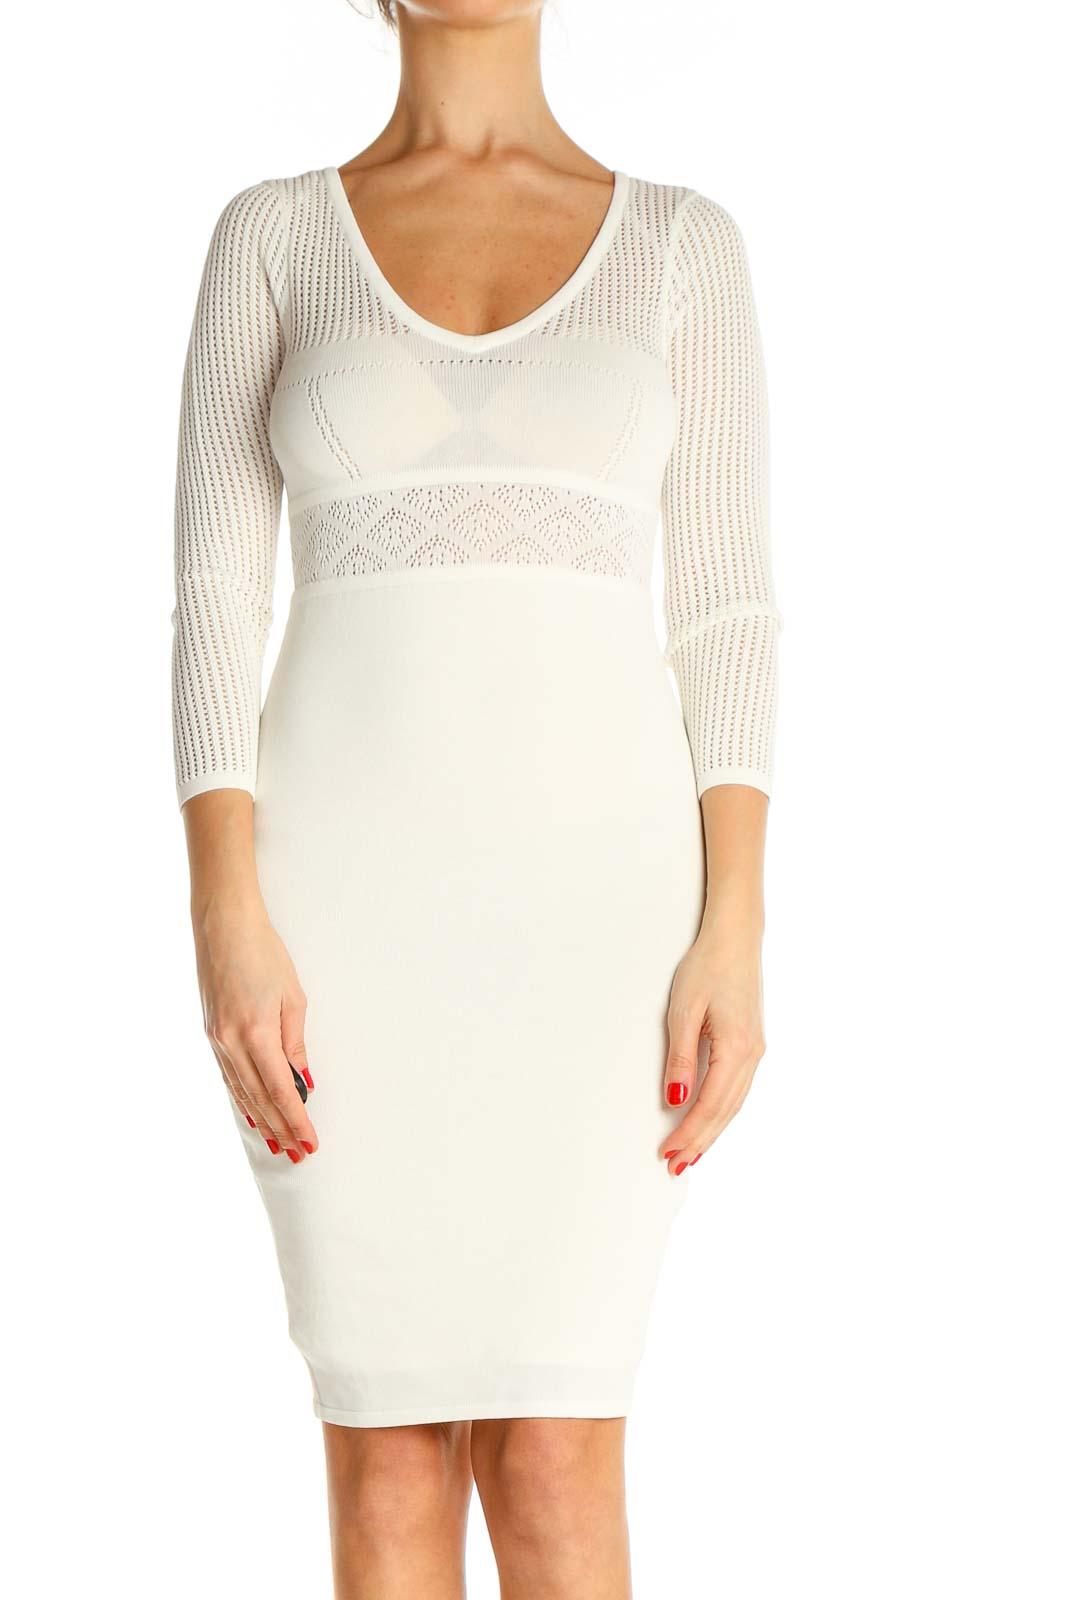 Beige Graphic Print Classic Sheath Dress Front